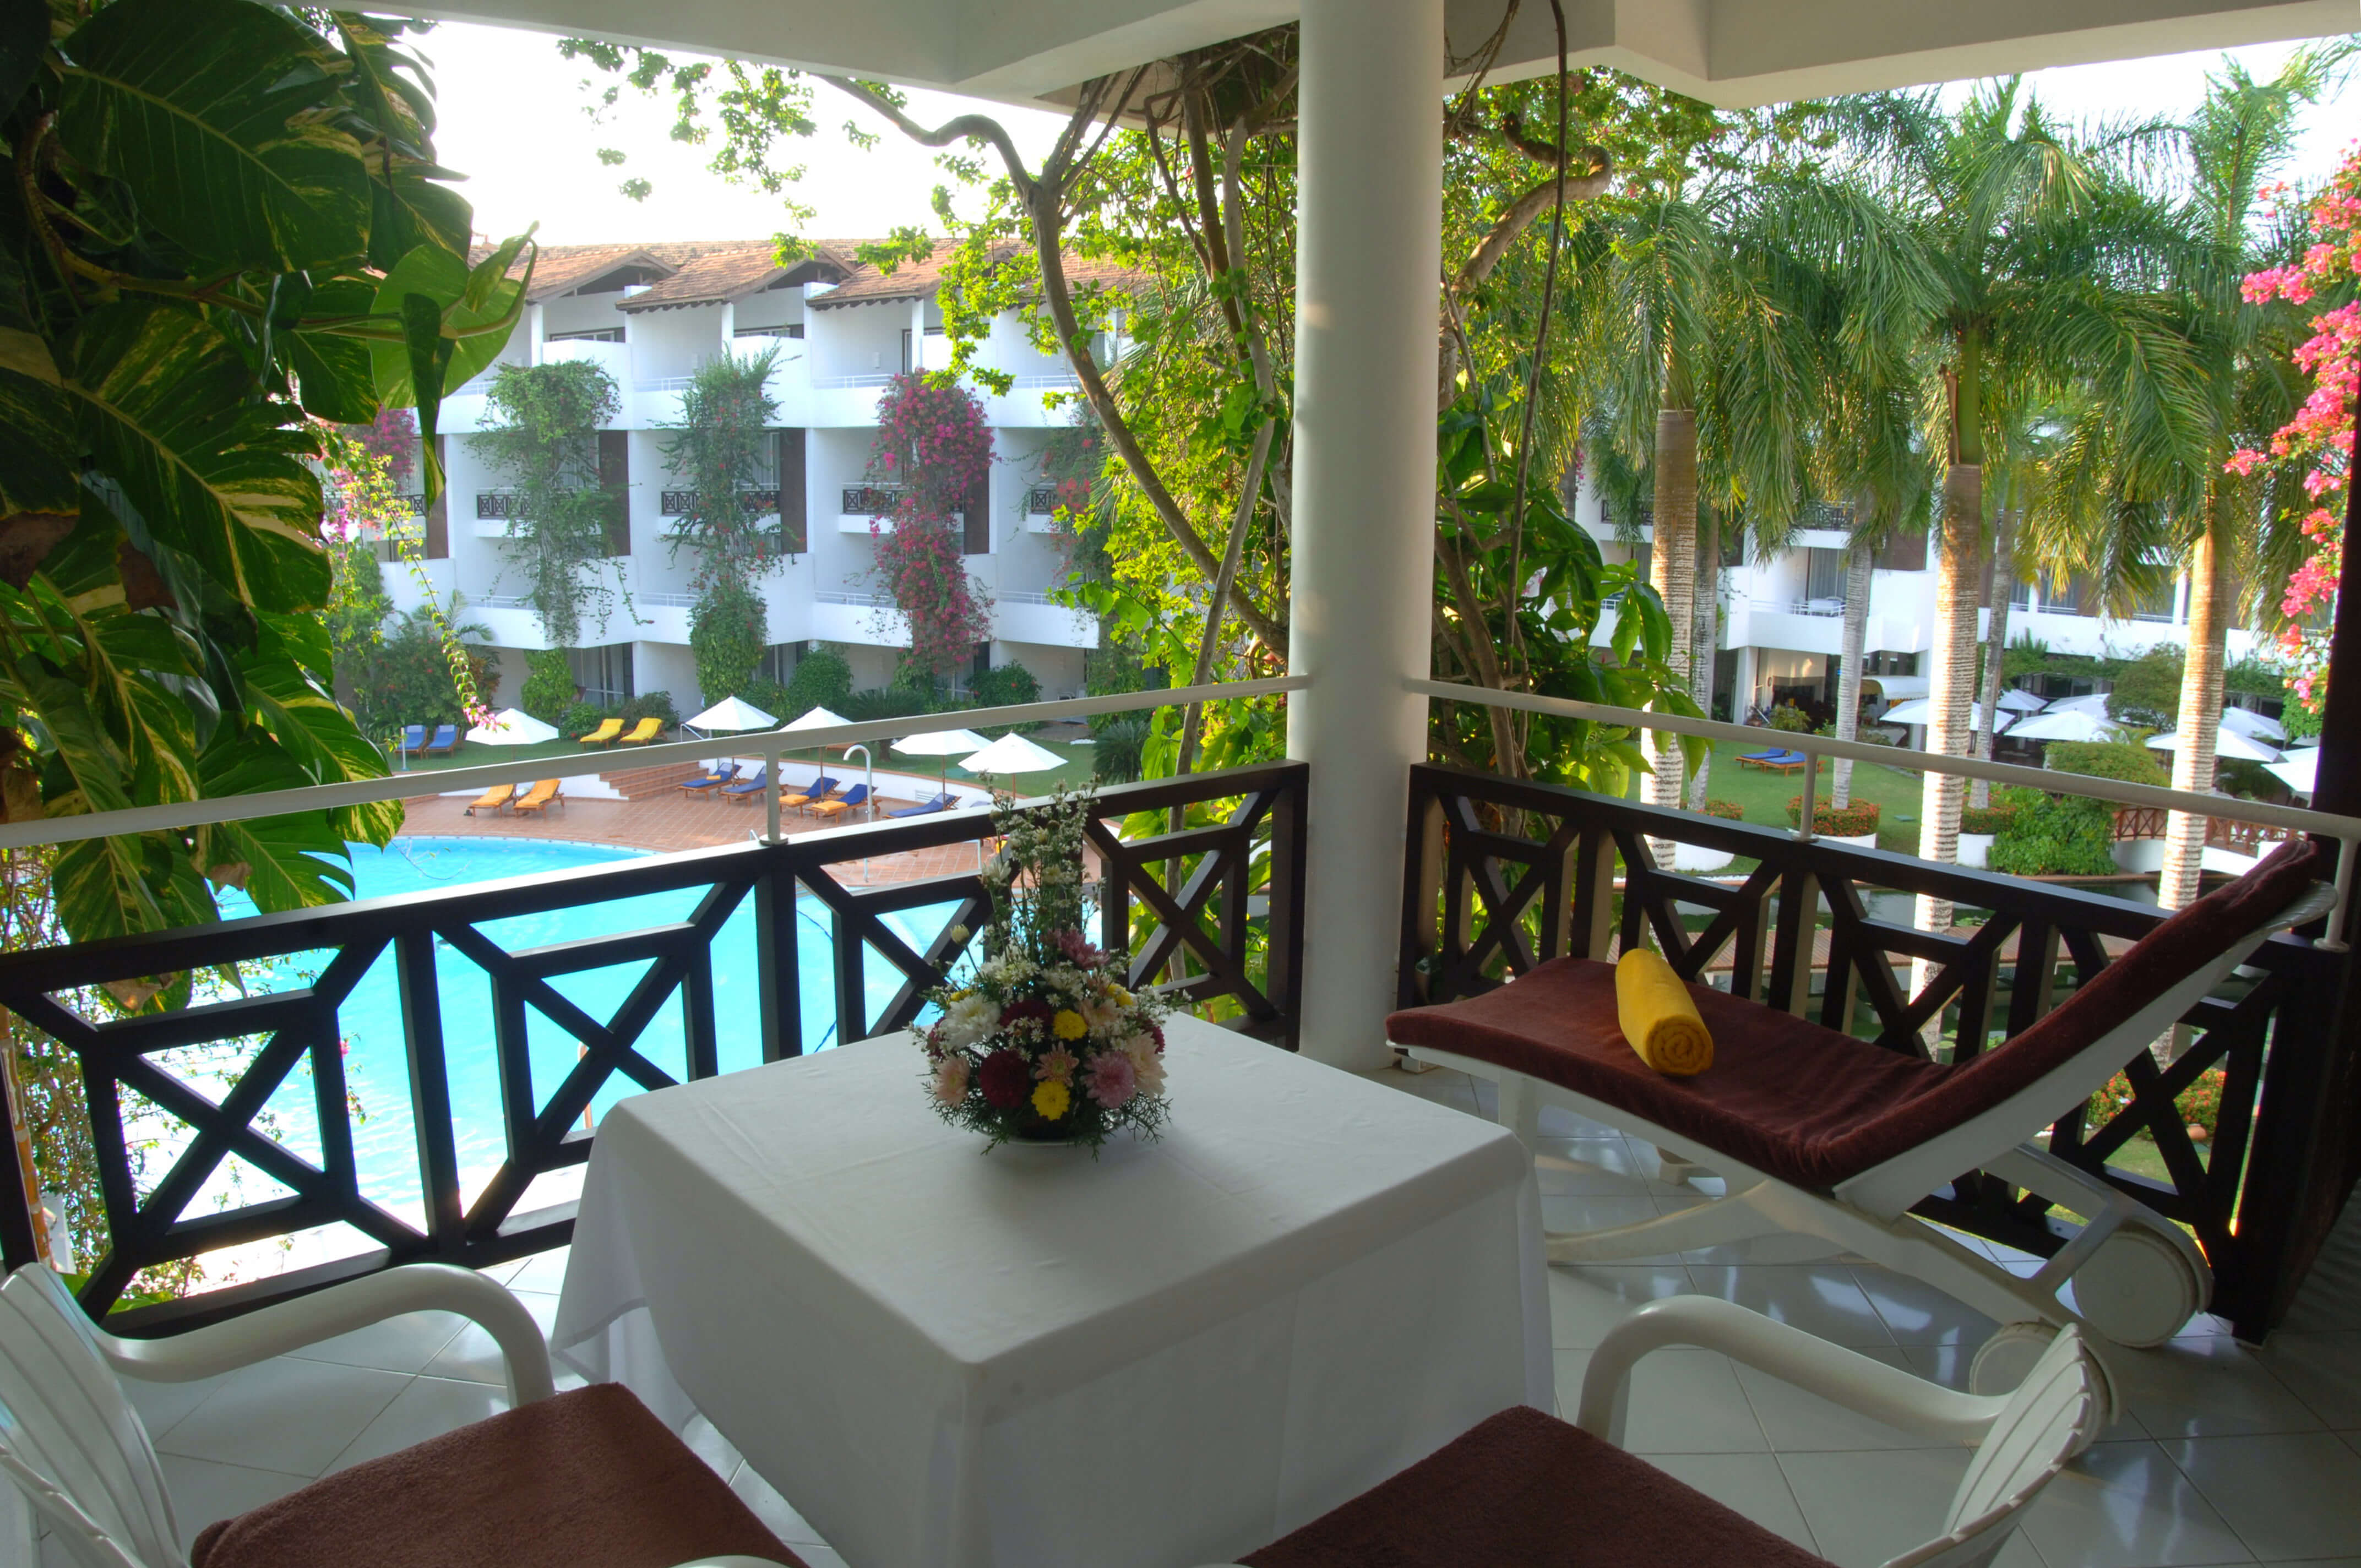 Blick aus comfort Zimmer in Garten - Sri lanka Ayurveda Hotel